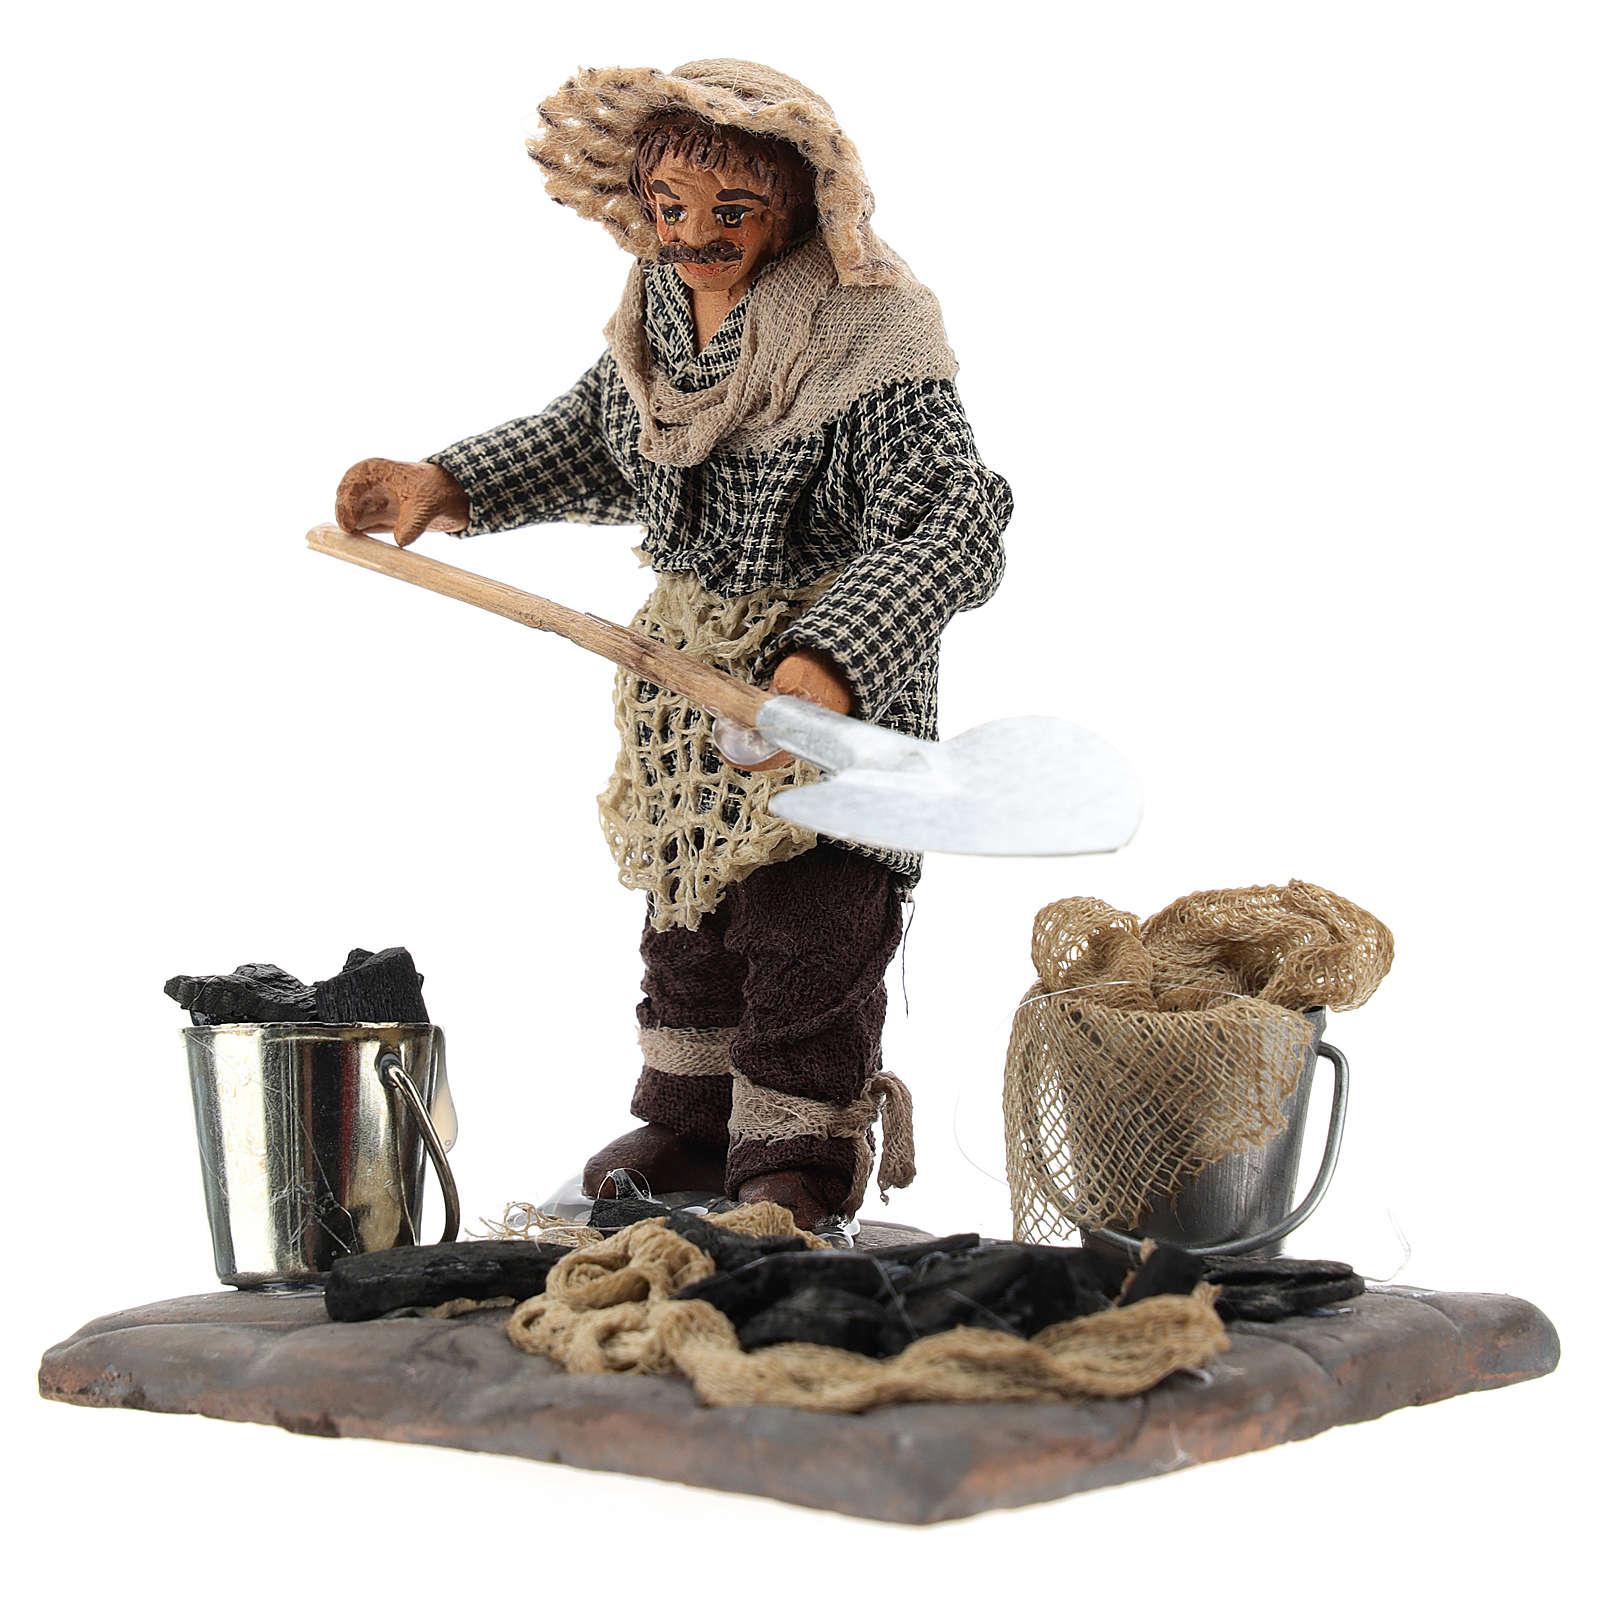 Neapolitan Nativity figurine, charcoal burner with base, 10 cm 4